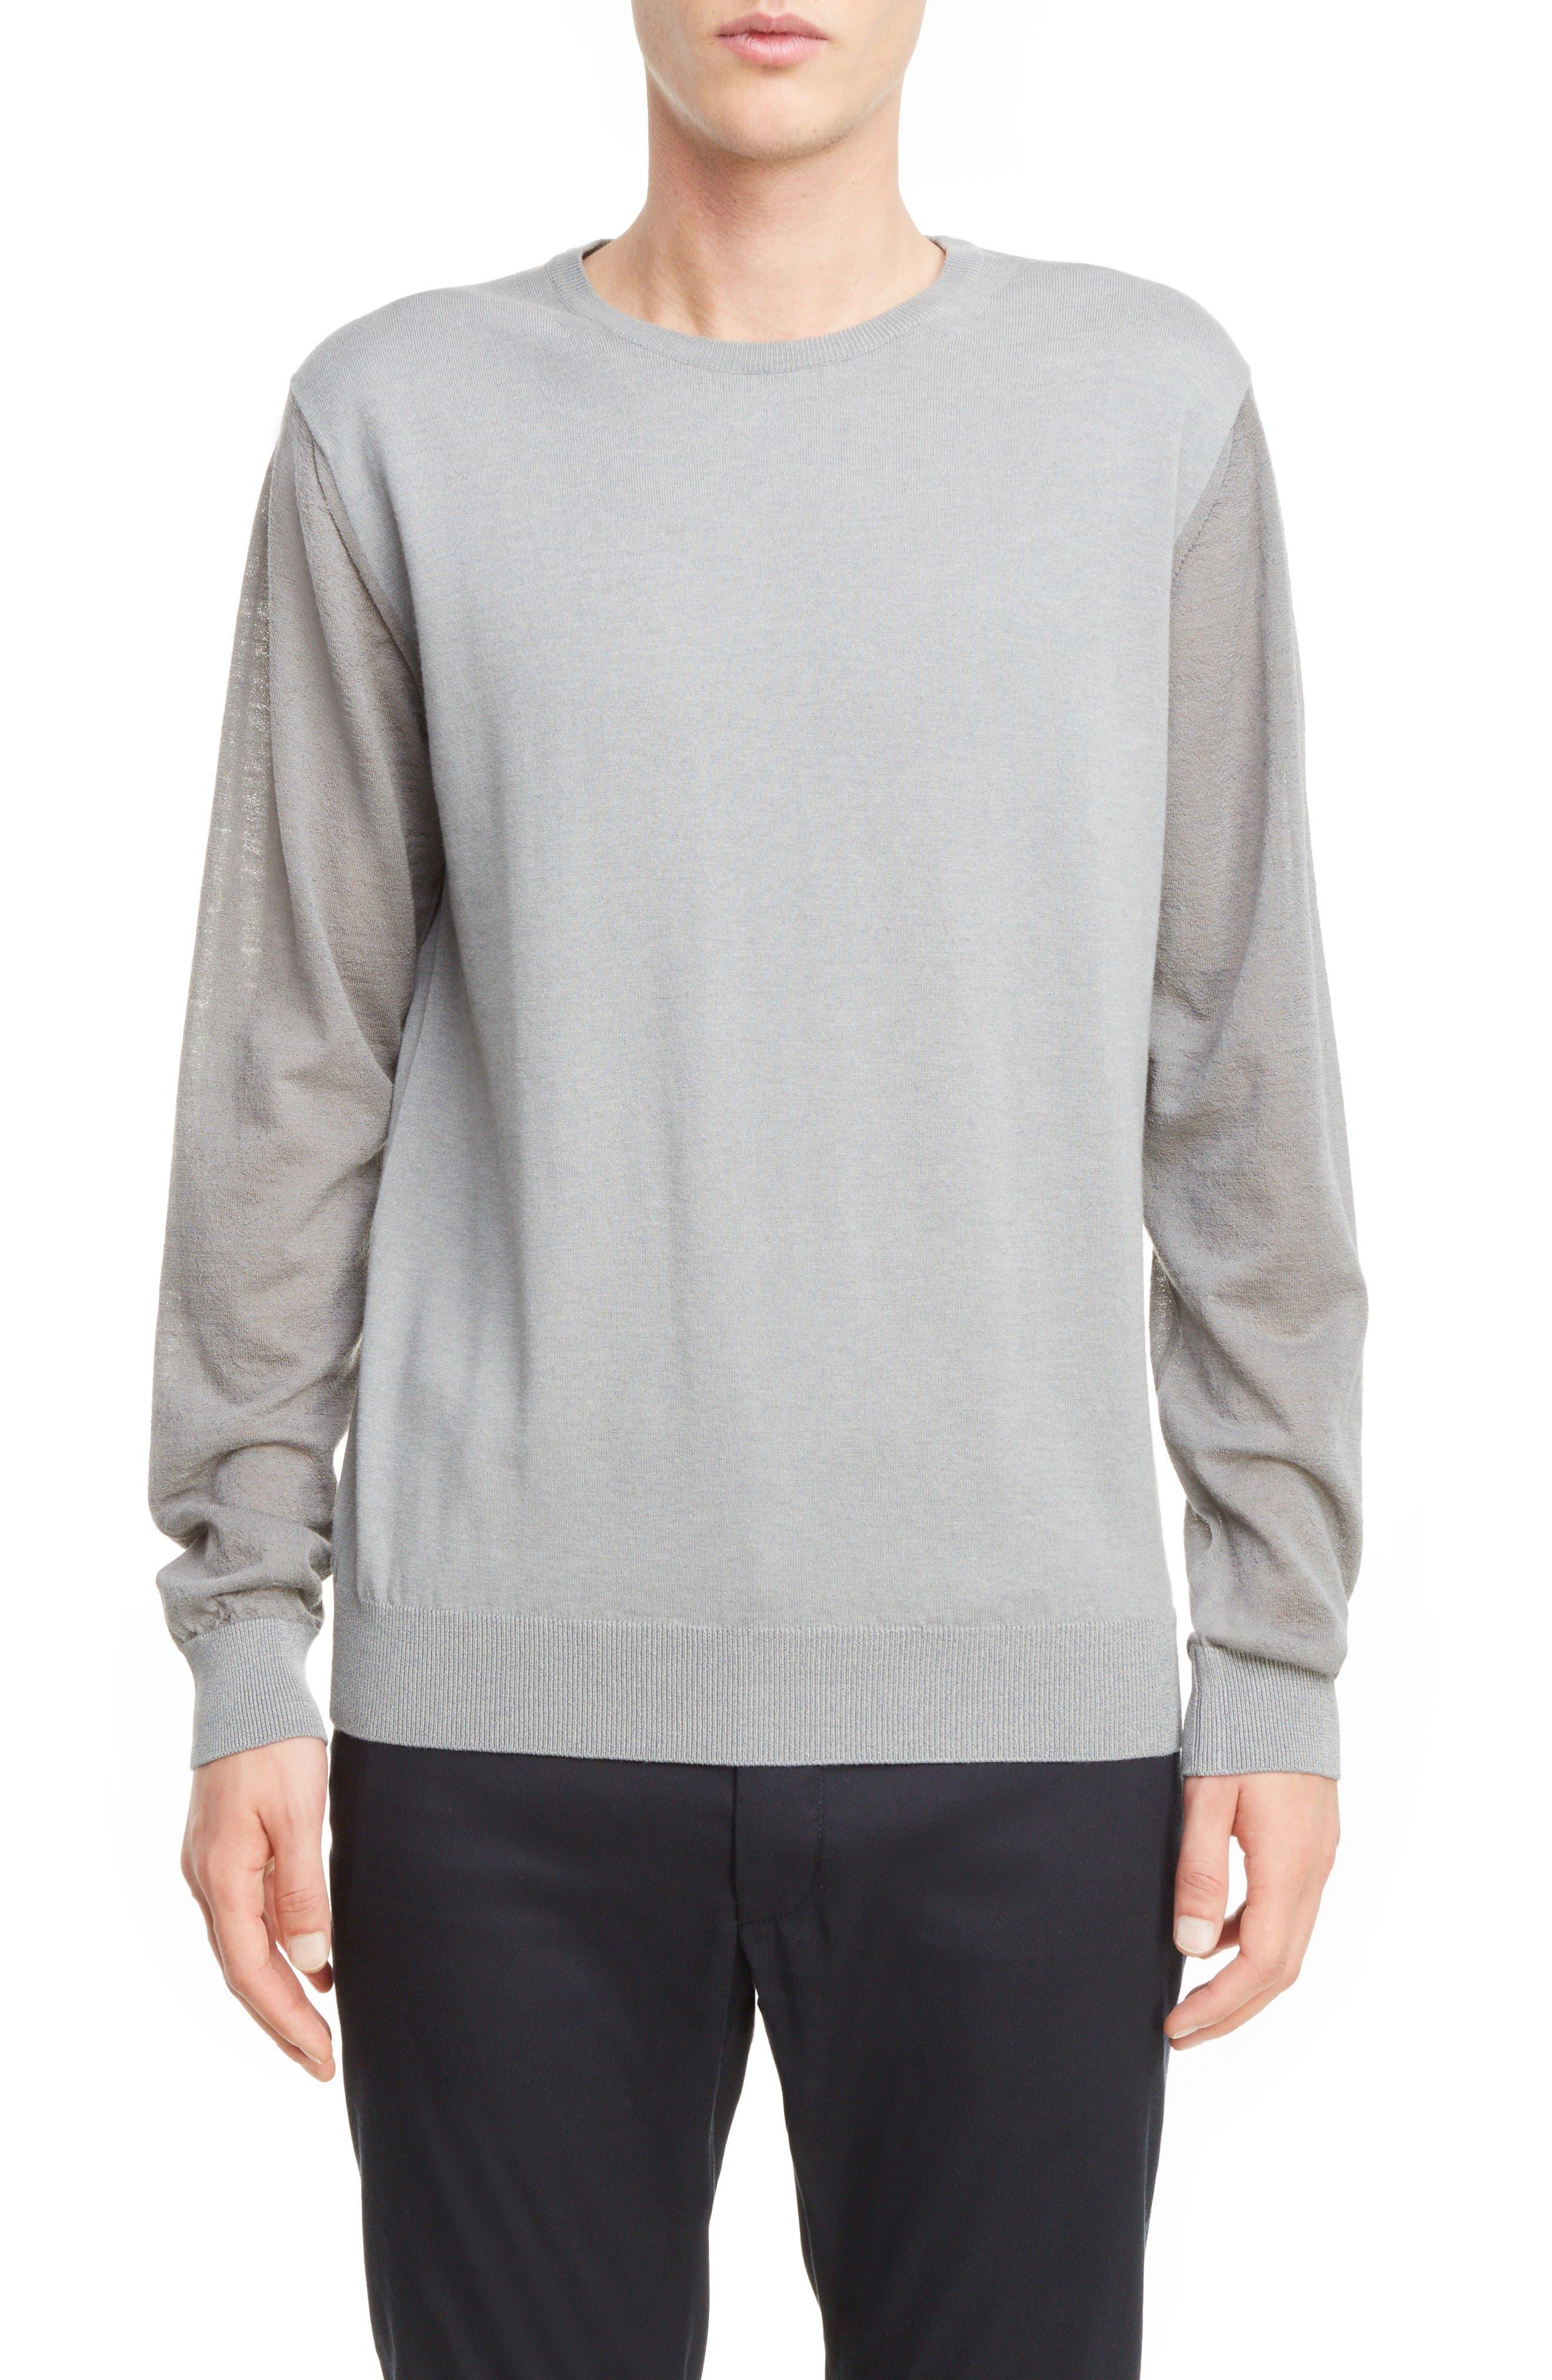 Lanvin Cotton & Wool Colorblock Pullover